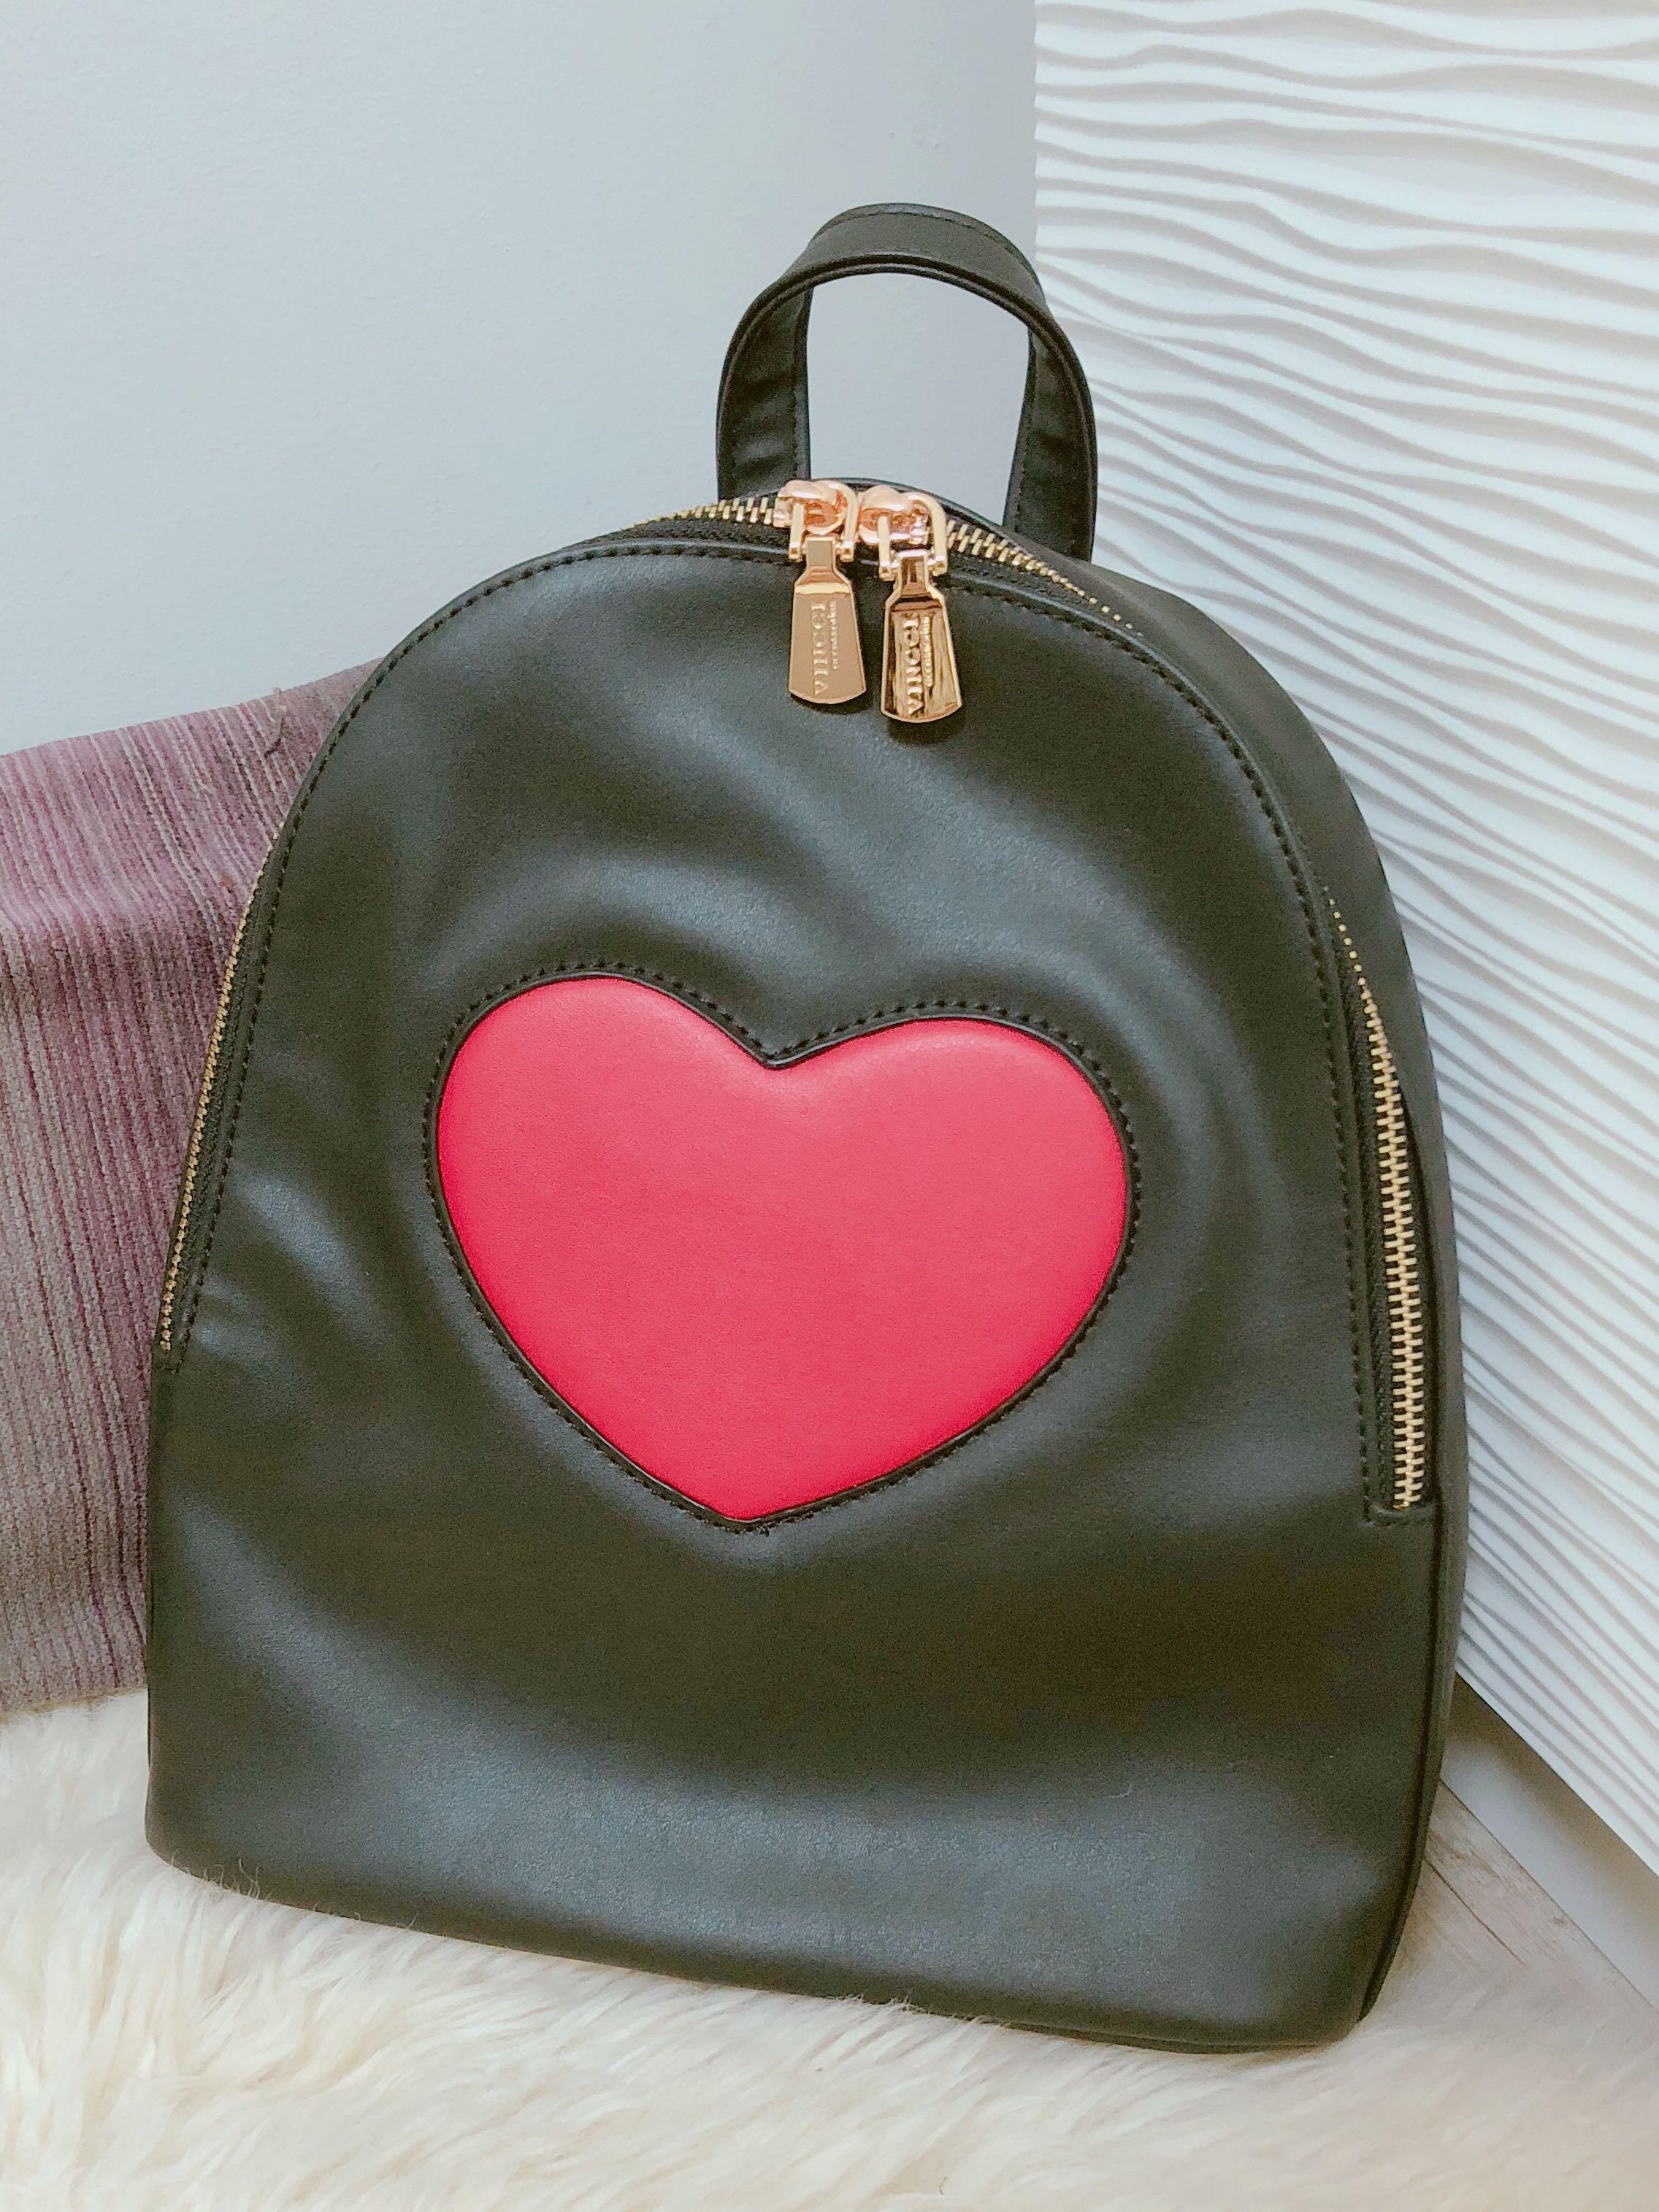 df768eabab Home · Women s Fashion · Bags   Wallets · Backpacks. photo photo photo photo